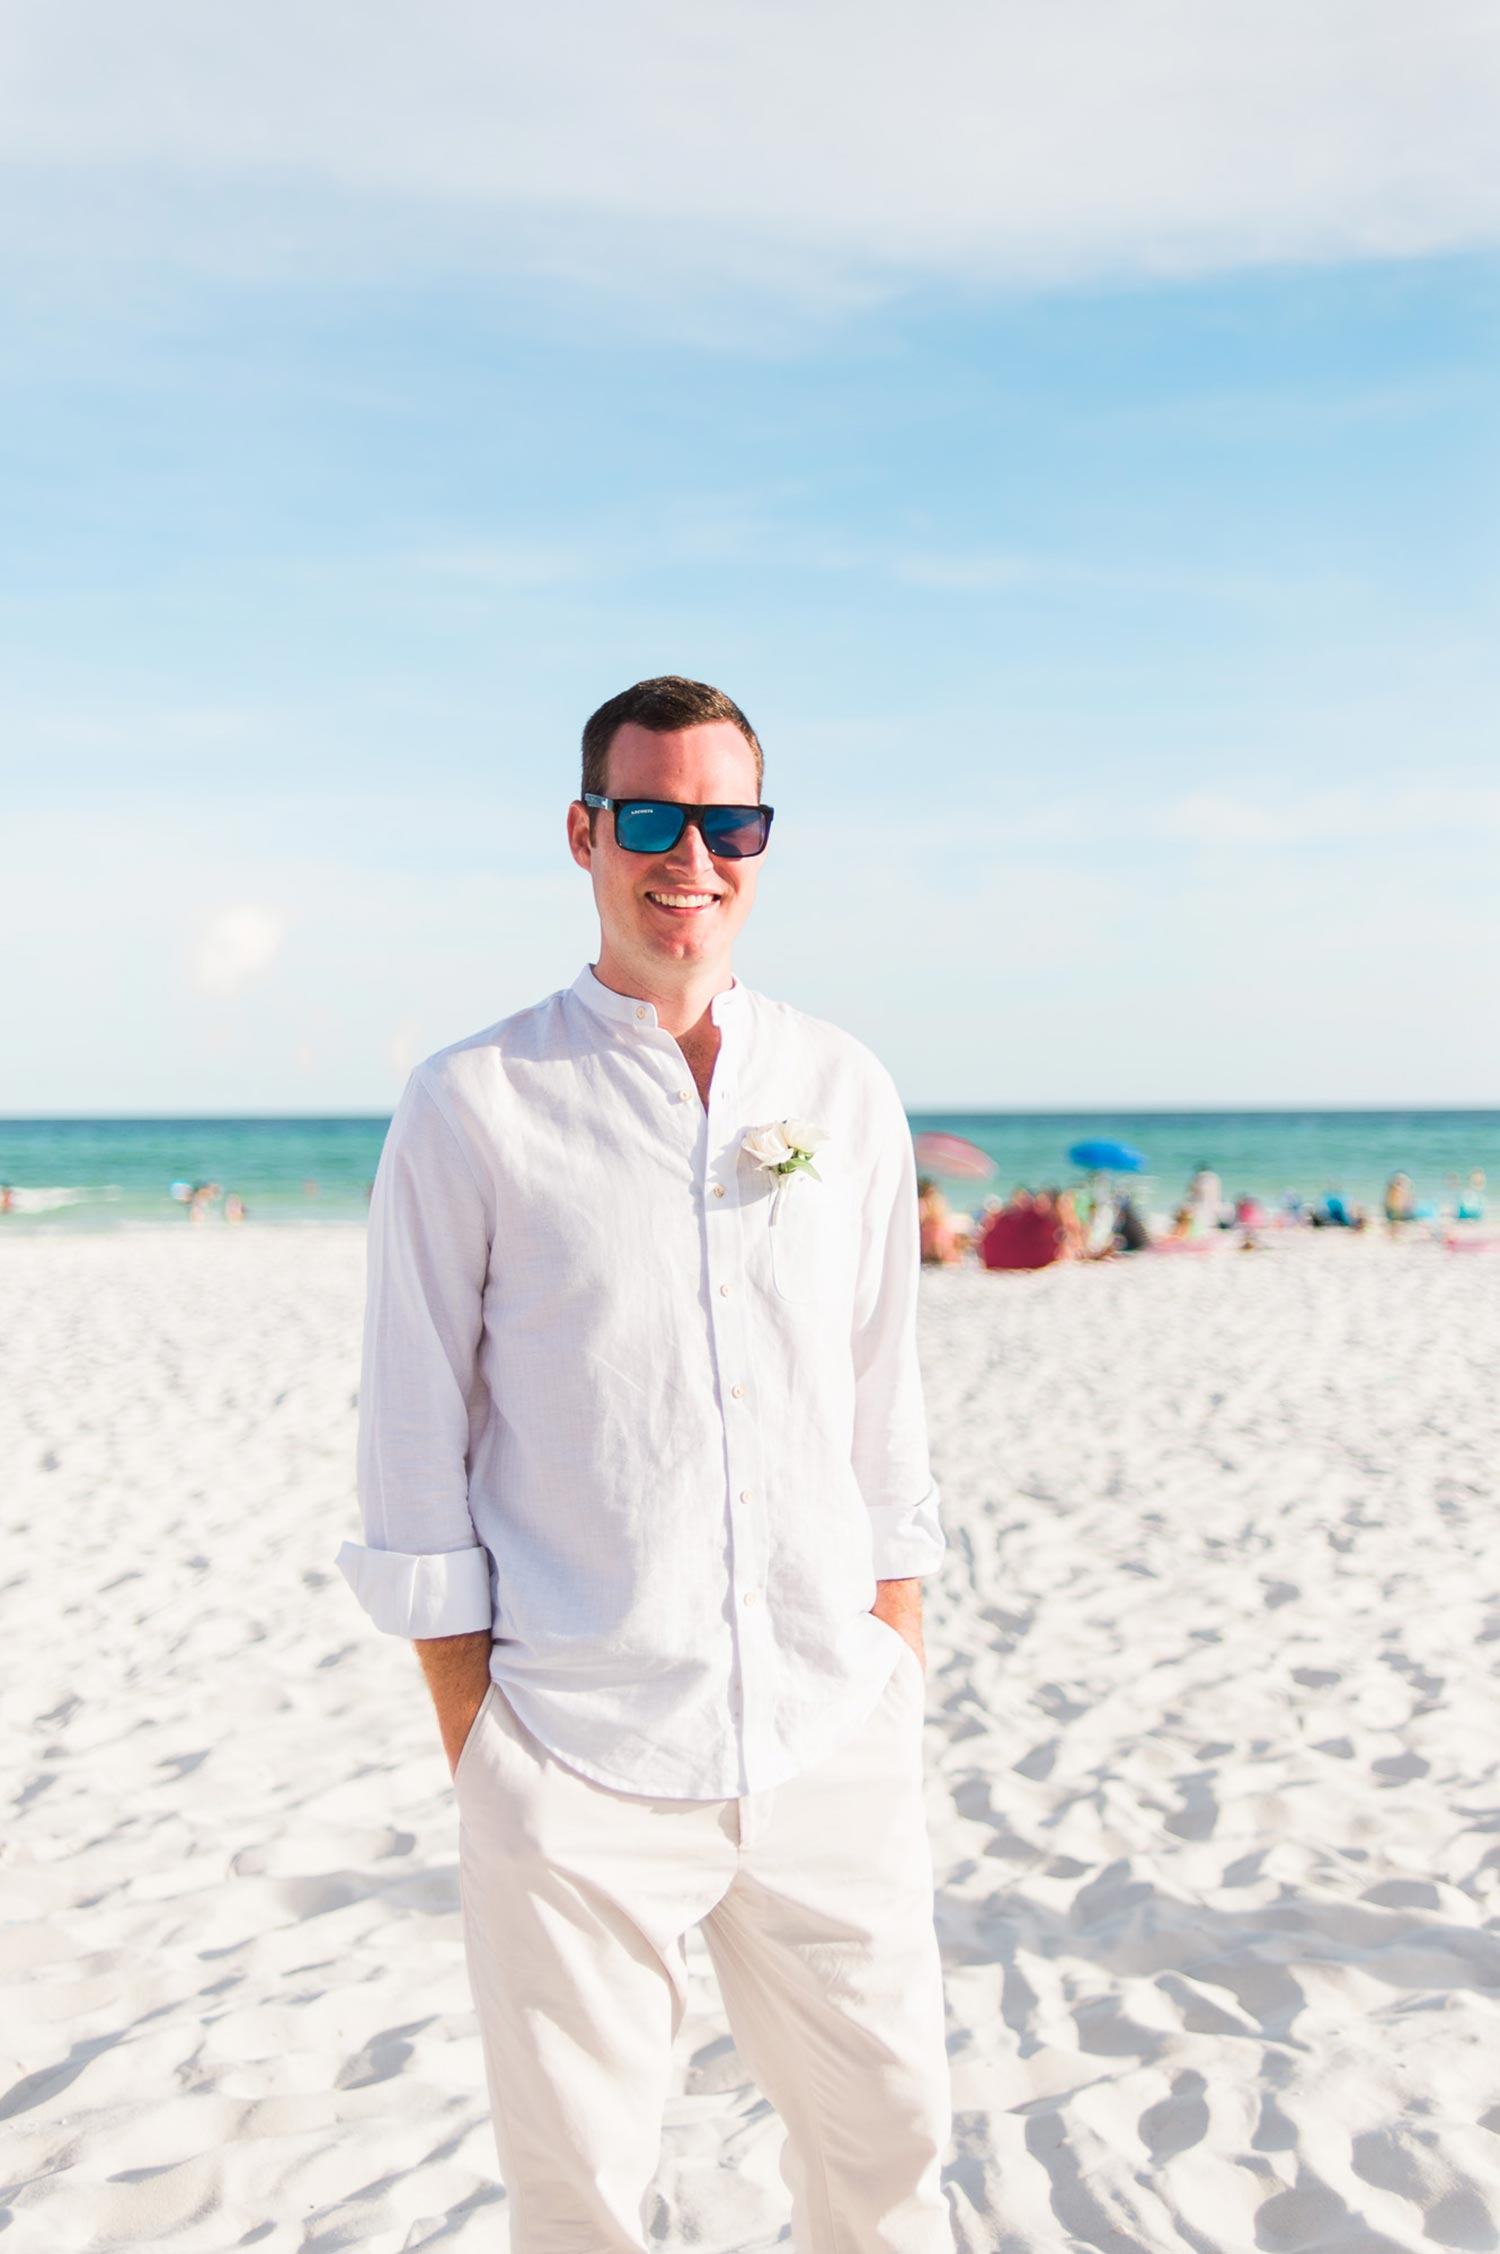 destin-beach-wedding-photographer (4).JPG